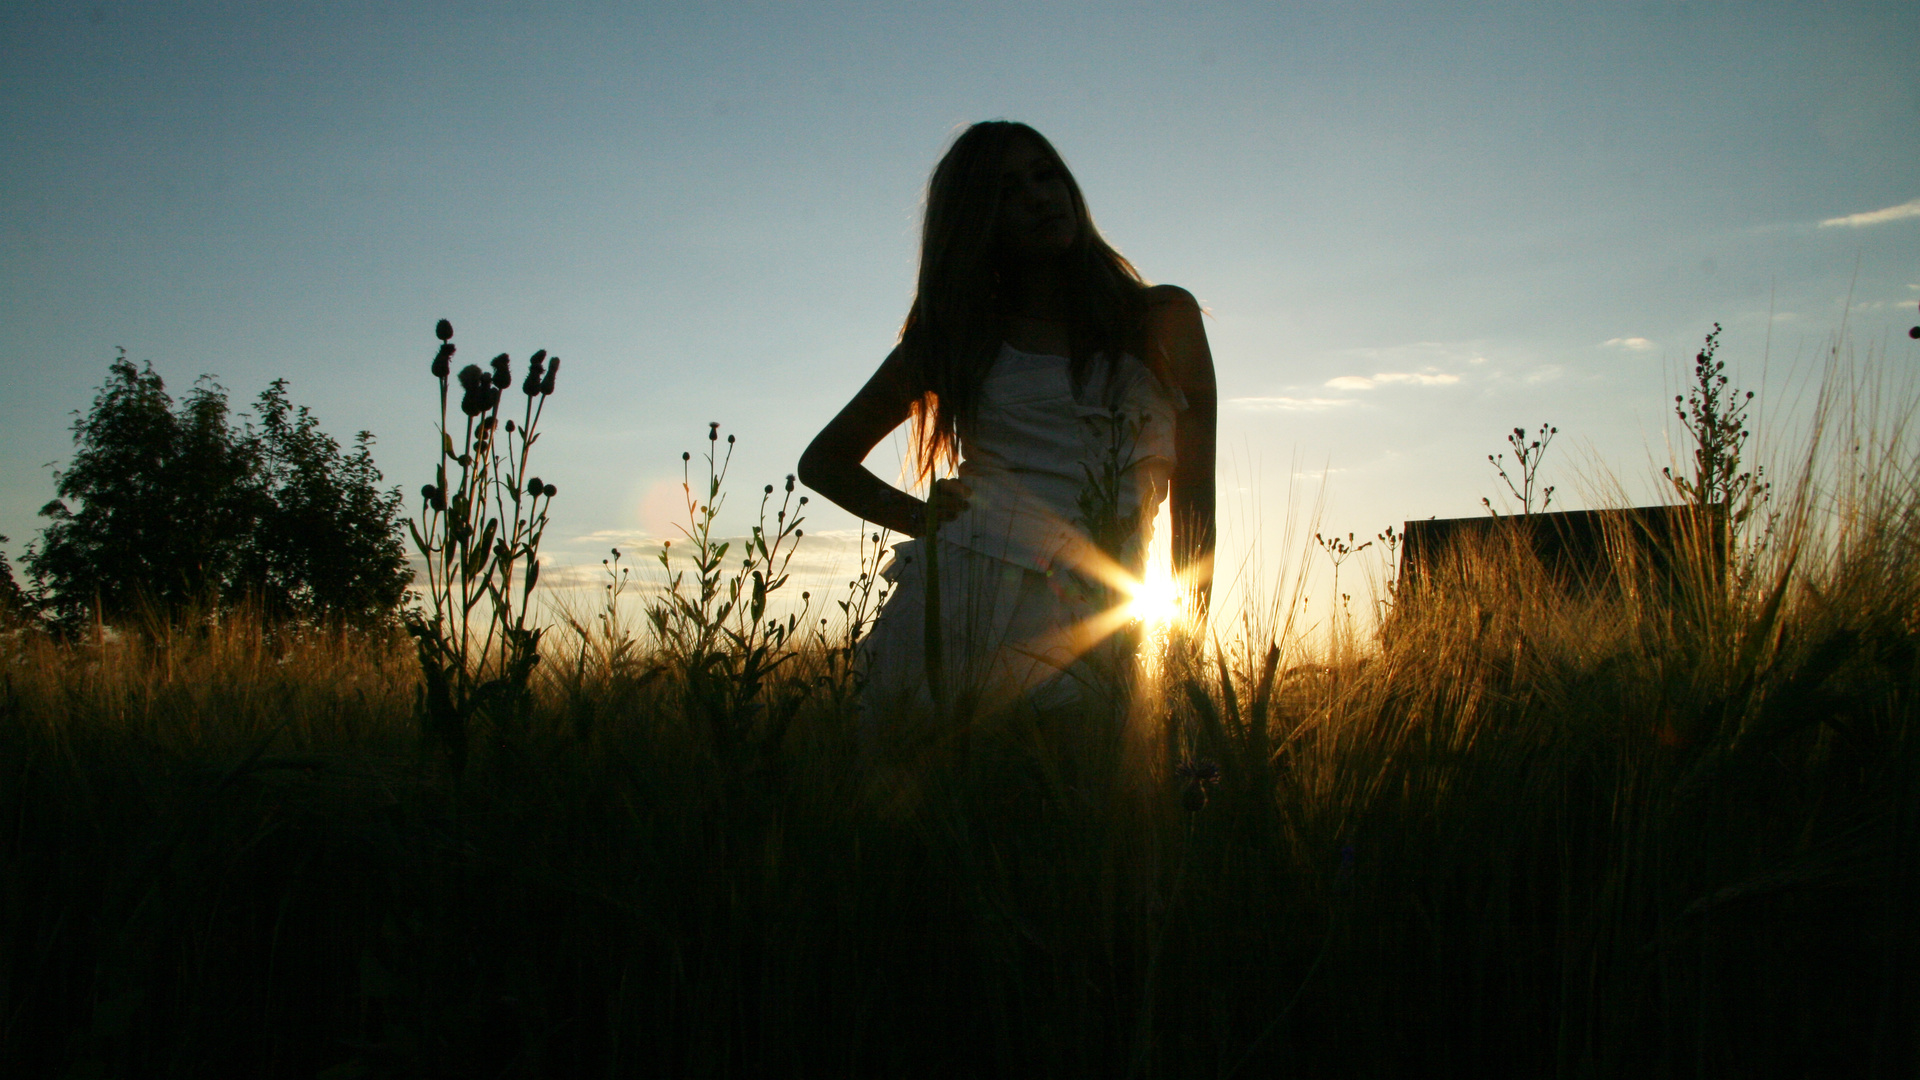 Картинки девушки в поле на аву